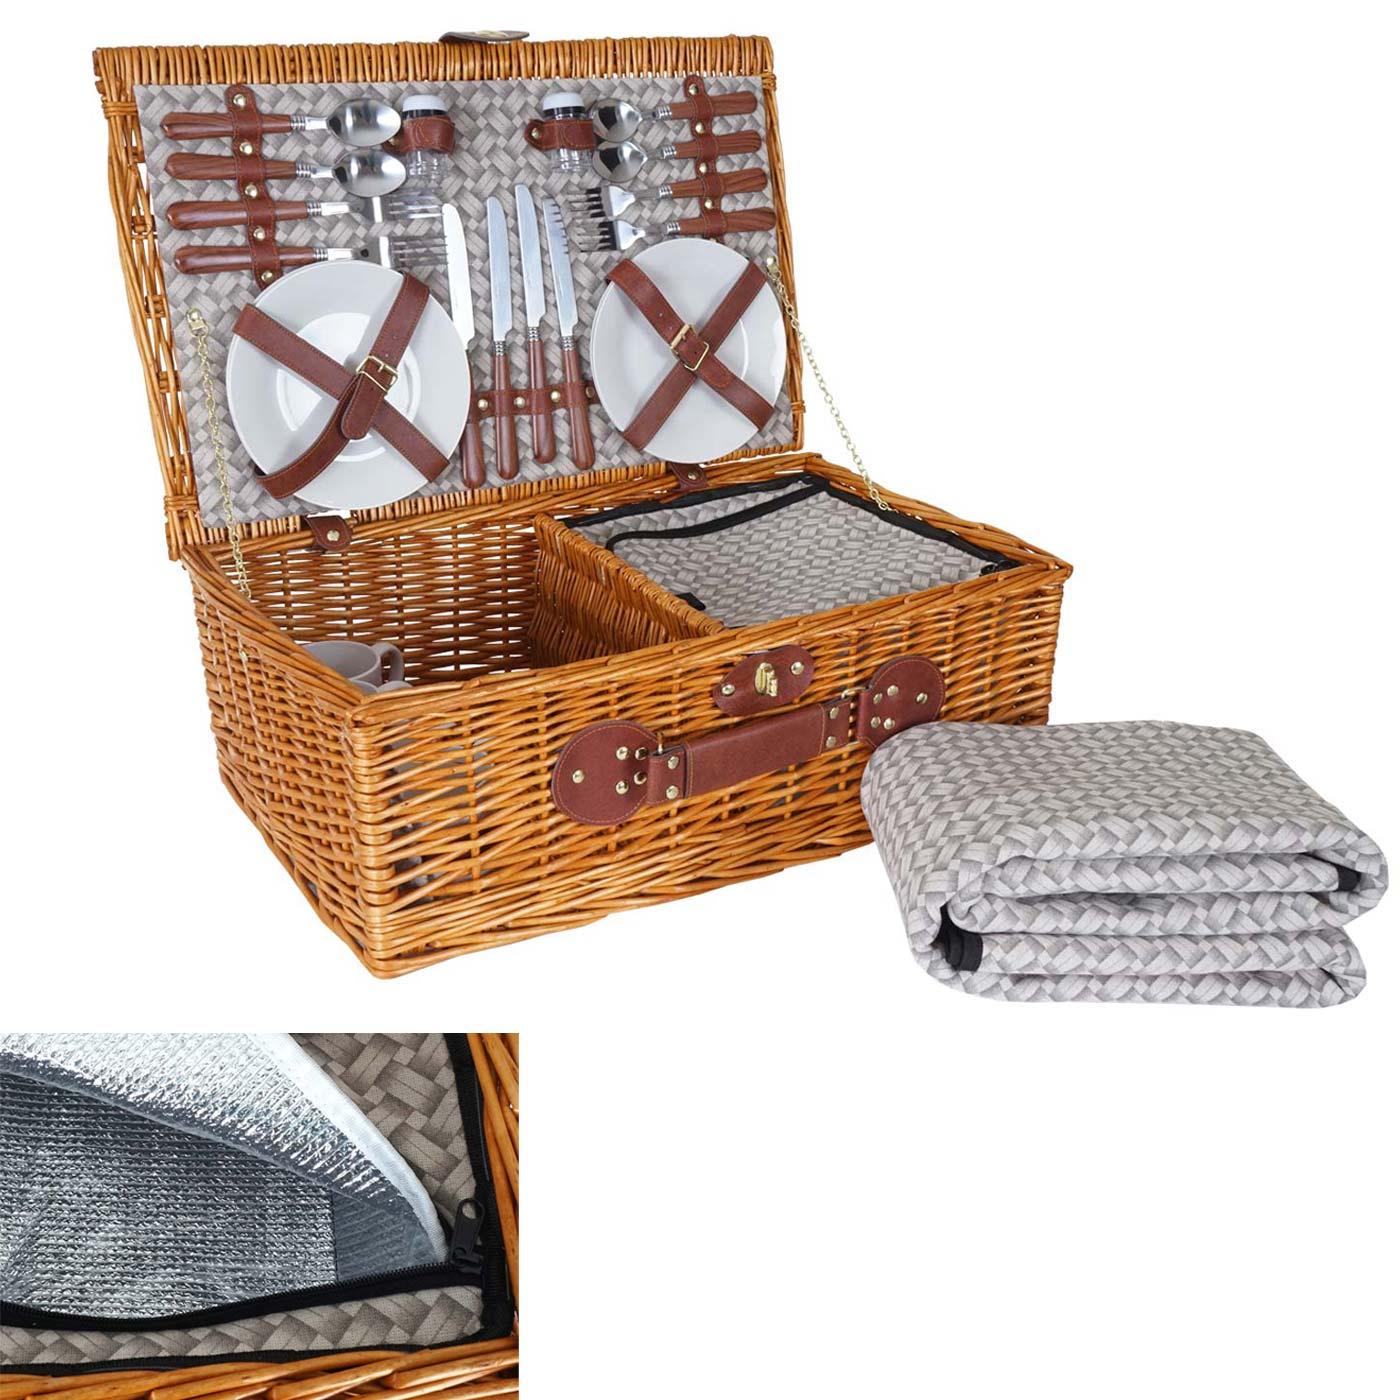 Mendler Picknickkorb-Set HWC-B25 für 4 Personen, Weiden-Korb + Kühlfach + Picknickdecke, Porzellan Edelstahl 60141